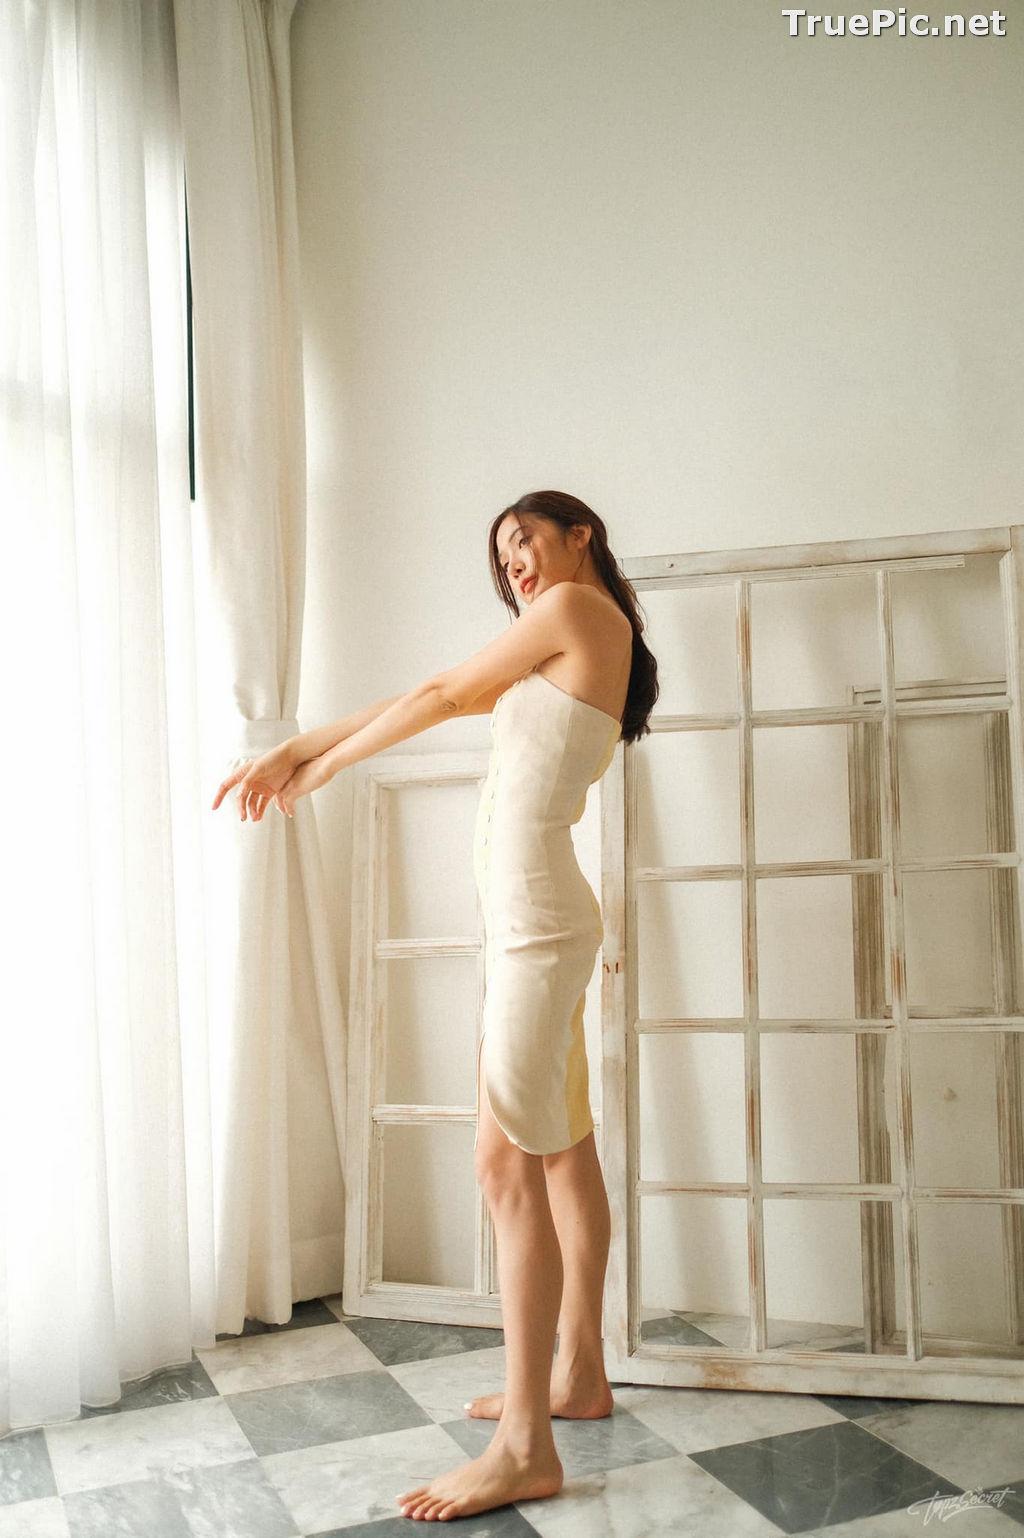 Image Thailand Model - Weeraya Sukaram - Concept Bodycon Dresses - TruePic.net - Picture-2